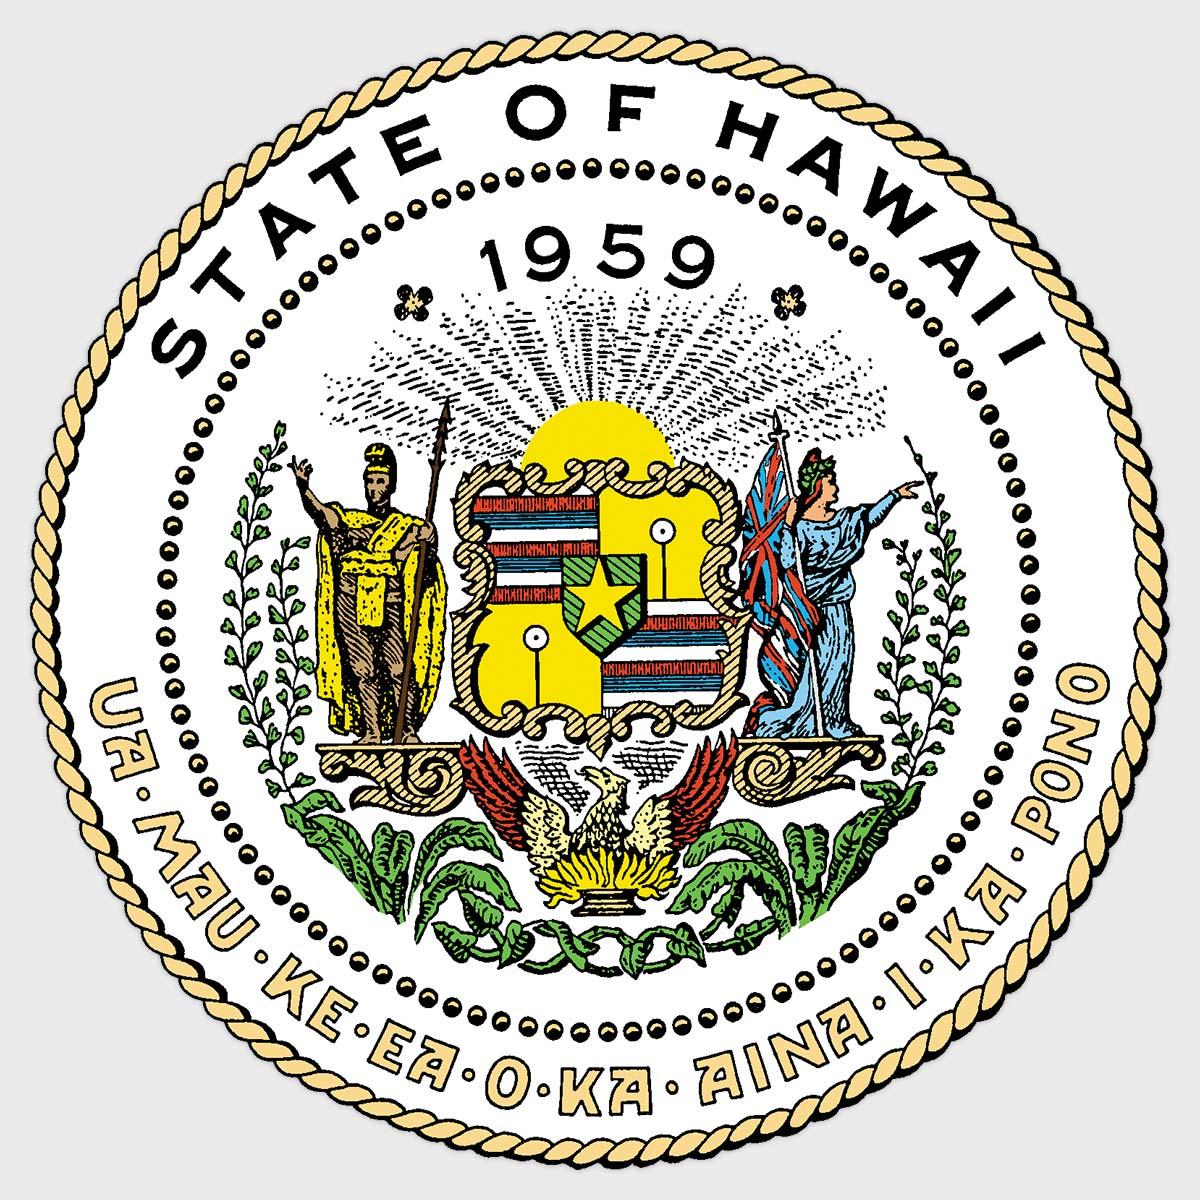 Hawaii Child Support Enforcement Agency logo